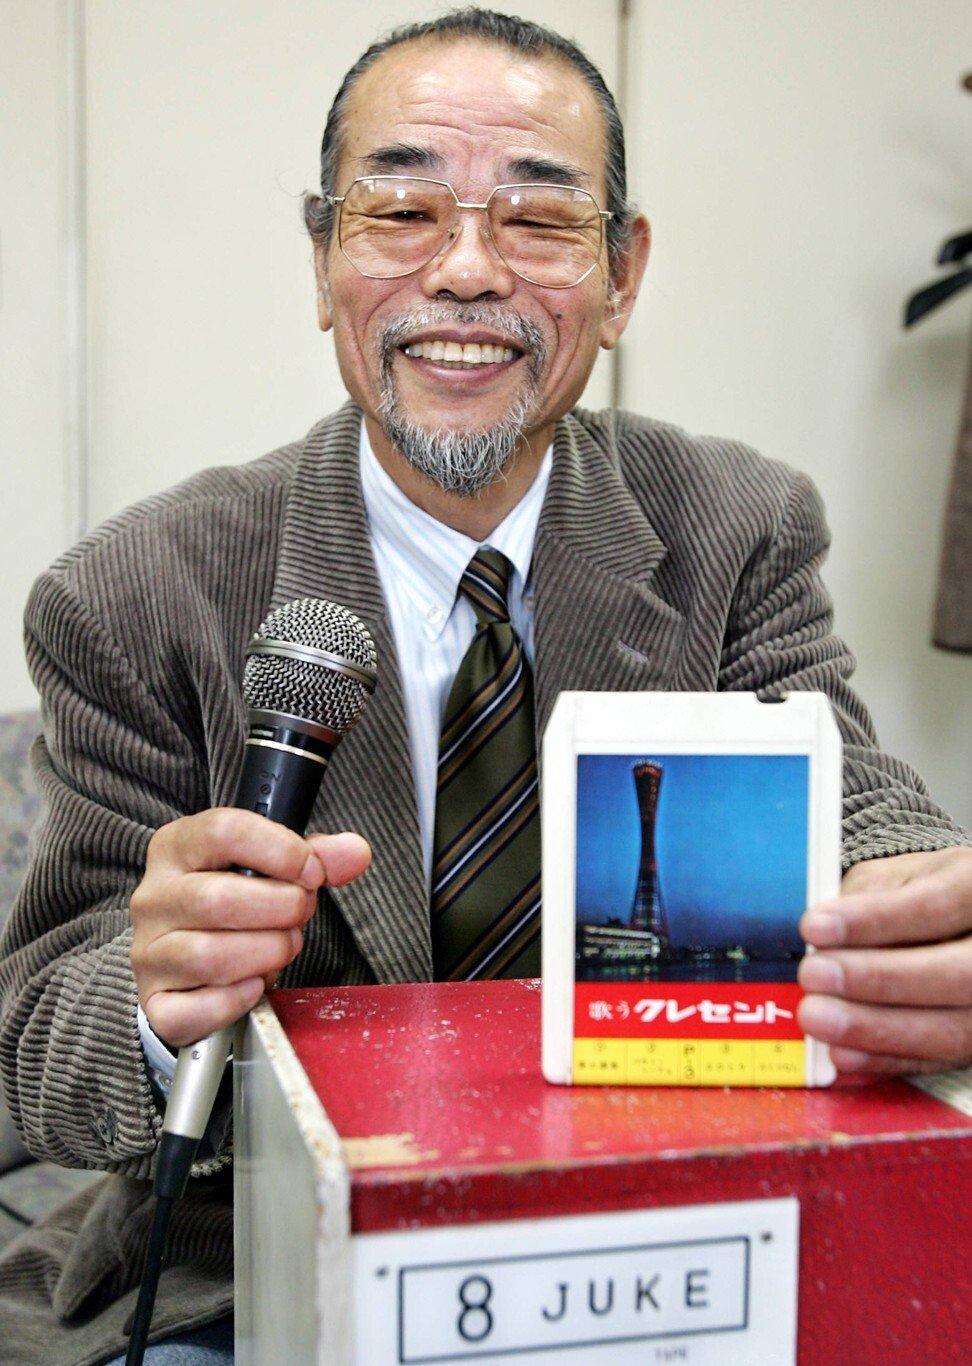 Inoue displays the Juke 8 karaoke machine and its music cartridge at his office in Nishinomiya city near Osaka, Japan in 2004. Photo: AFP